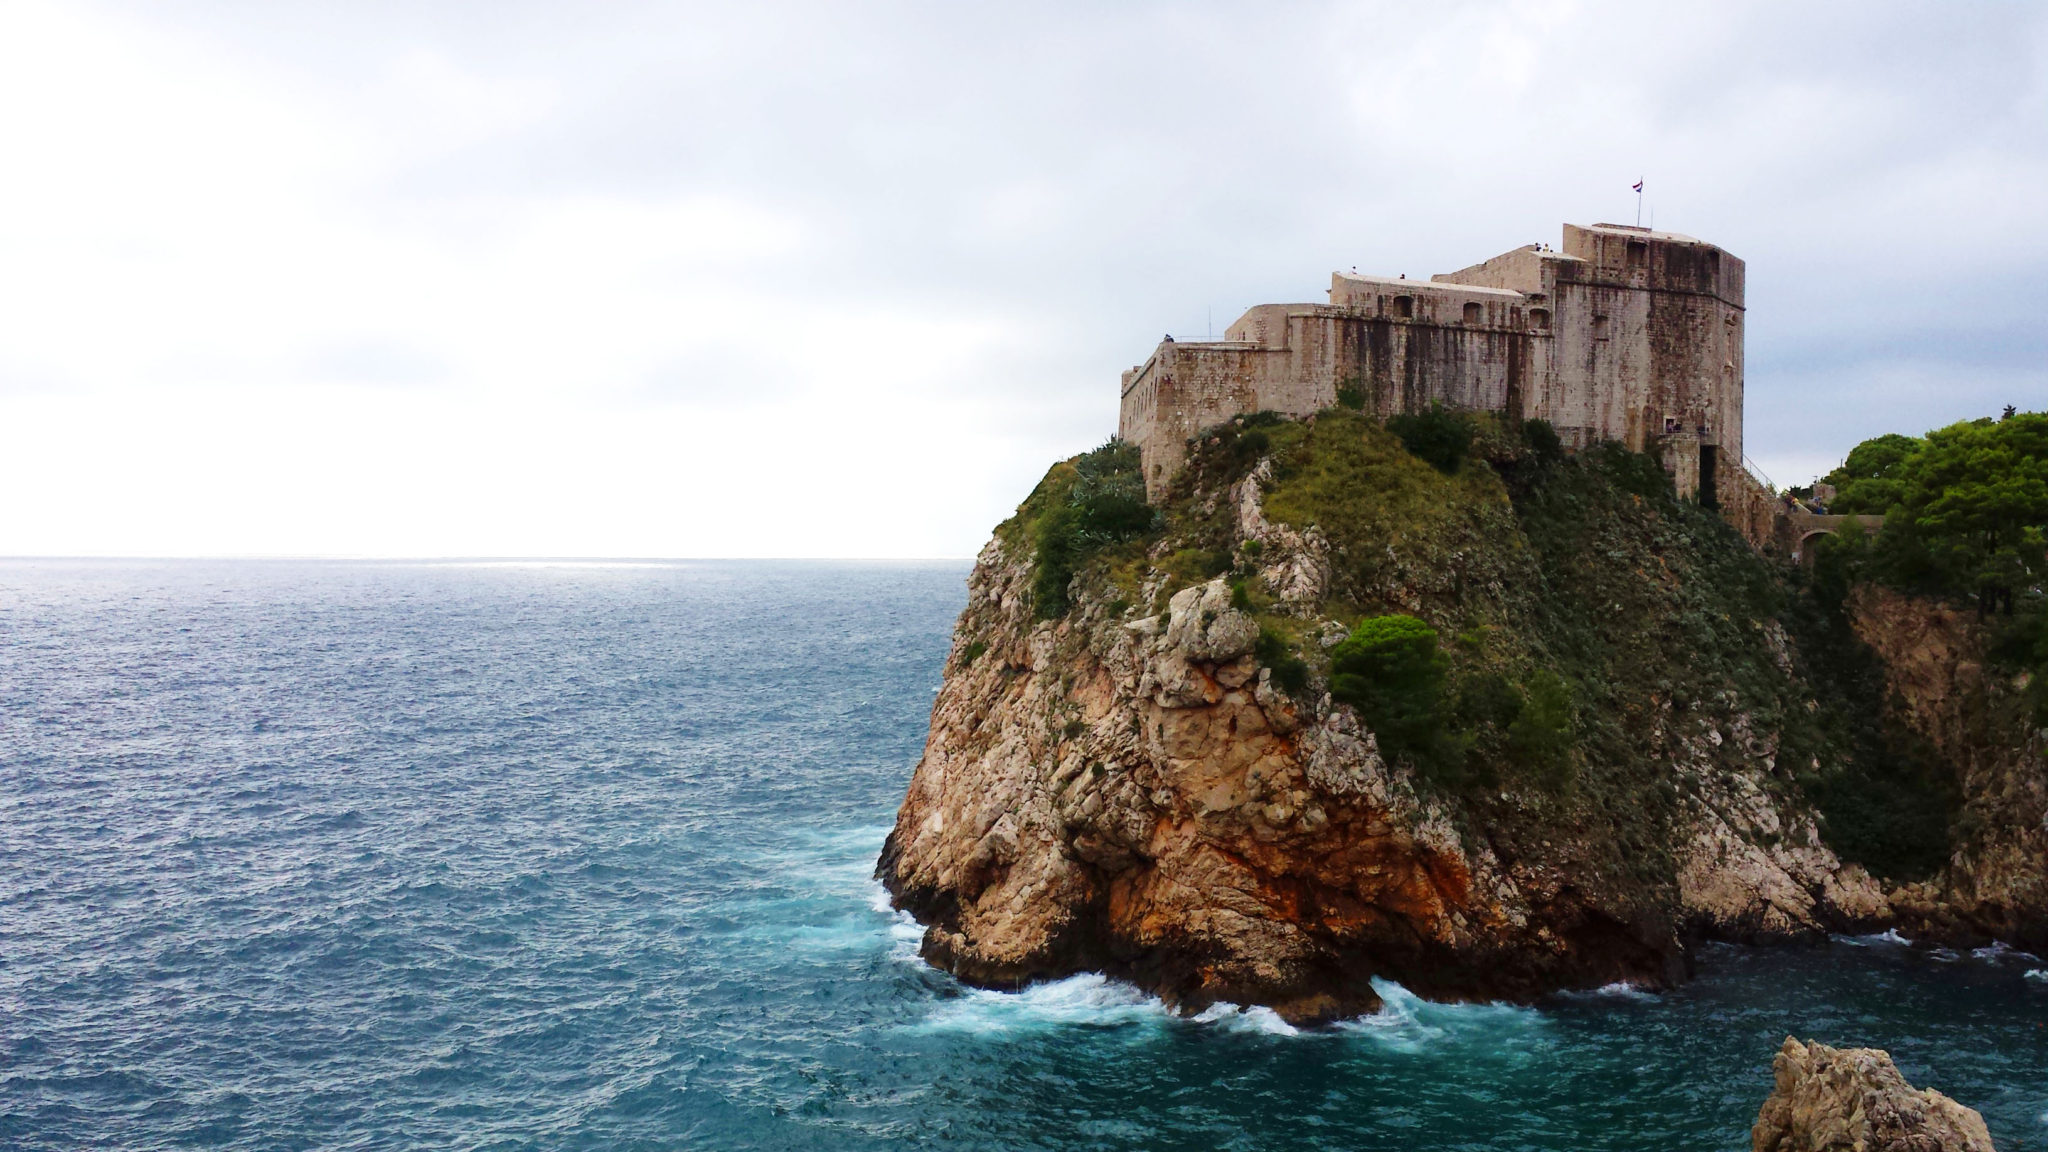 Hema_blog_mode_voyage_croatie_une_journee_a_dubrovnik_vue_des_remparts10